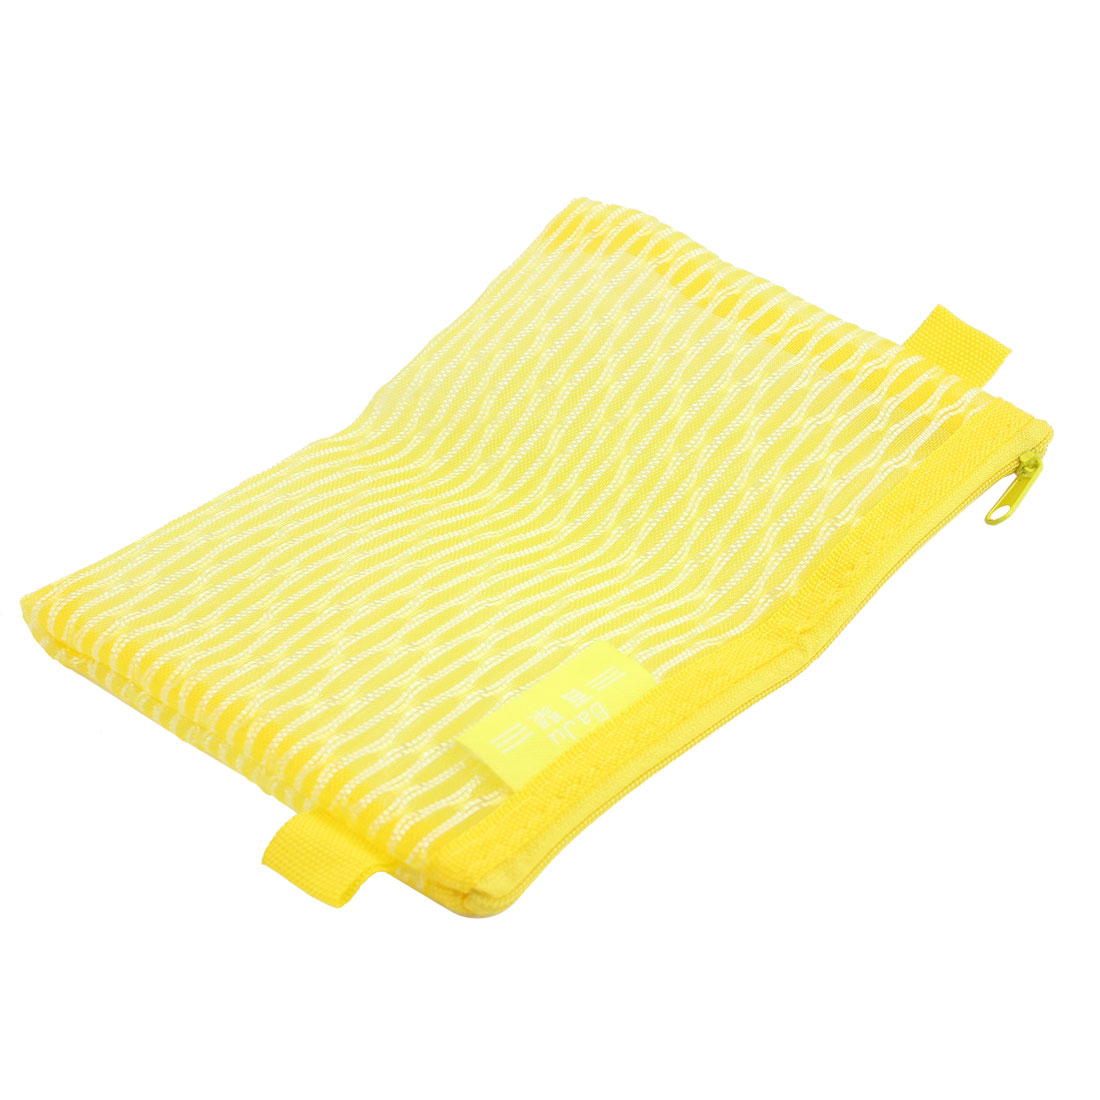 Mesh Design Zipper Closure File Bag Office Document Holder Organizer Yellow